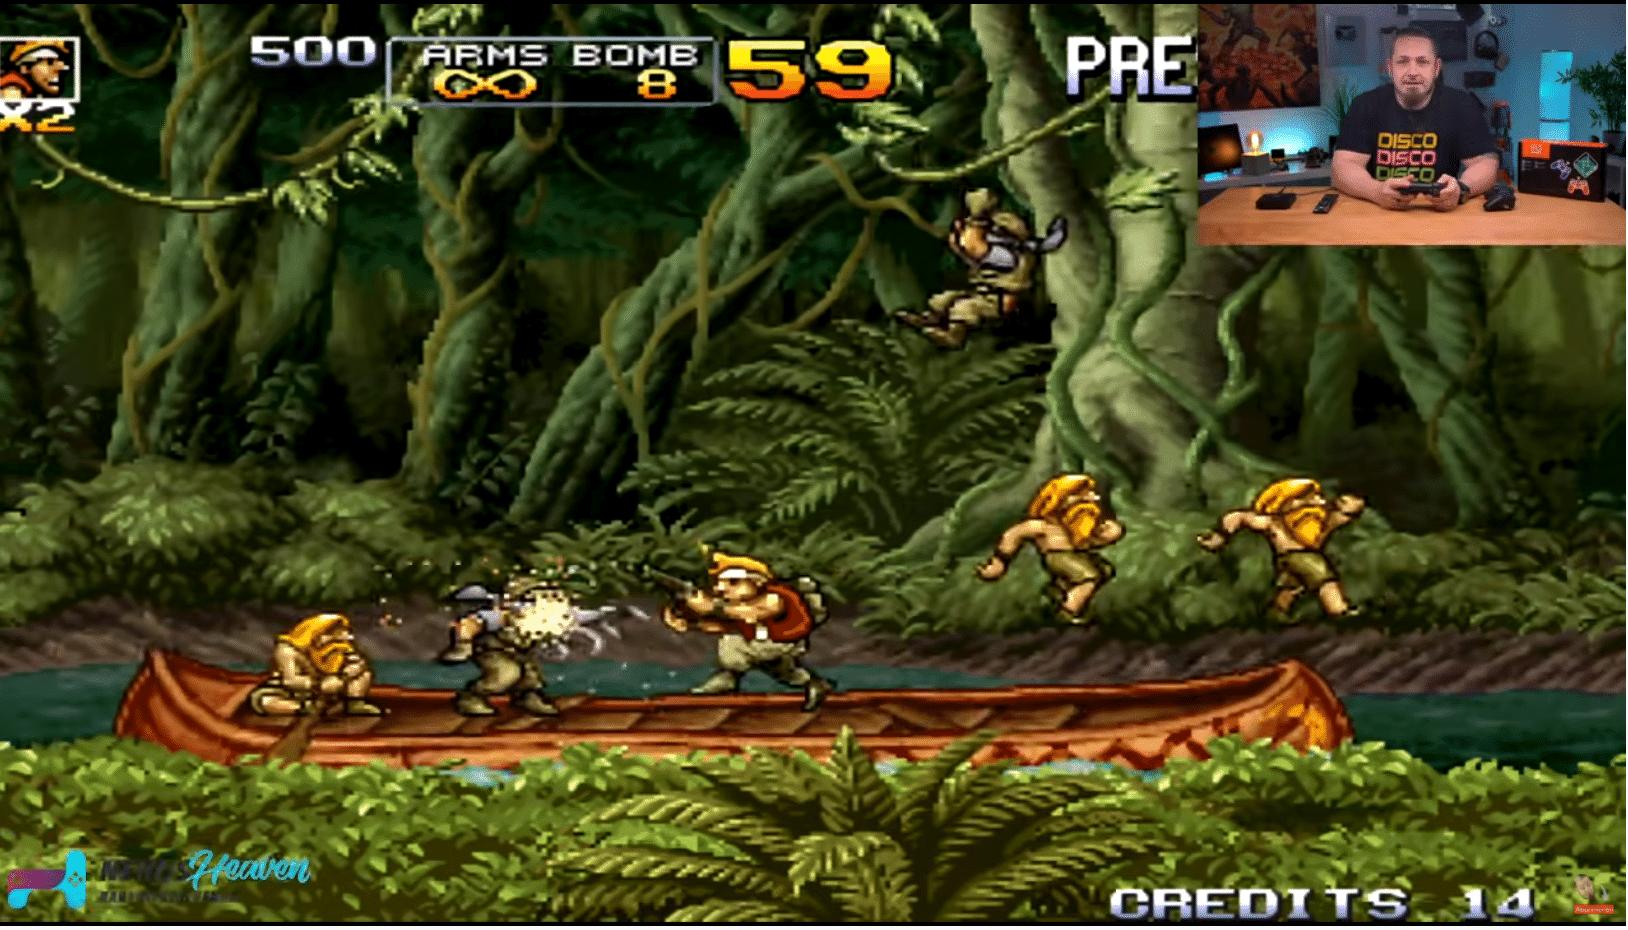 Gamebox G5 System Emulation